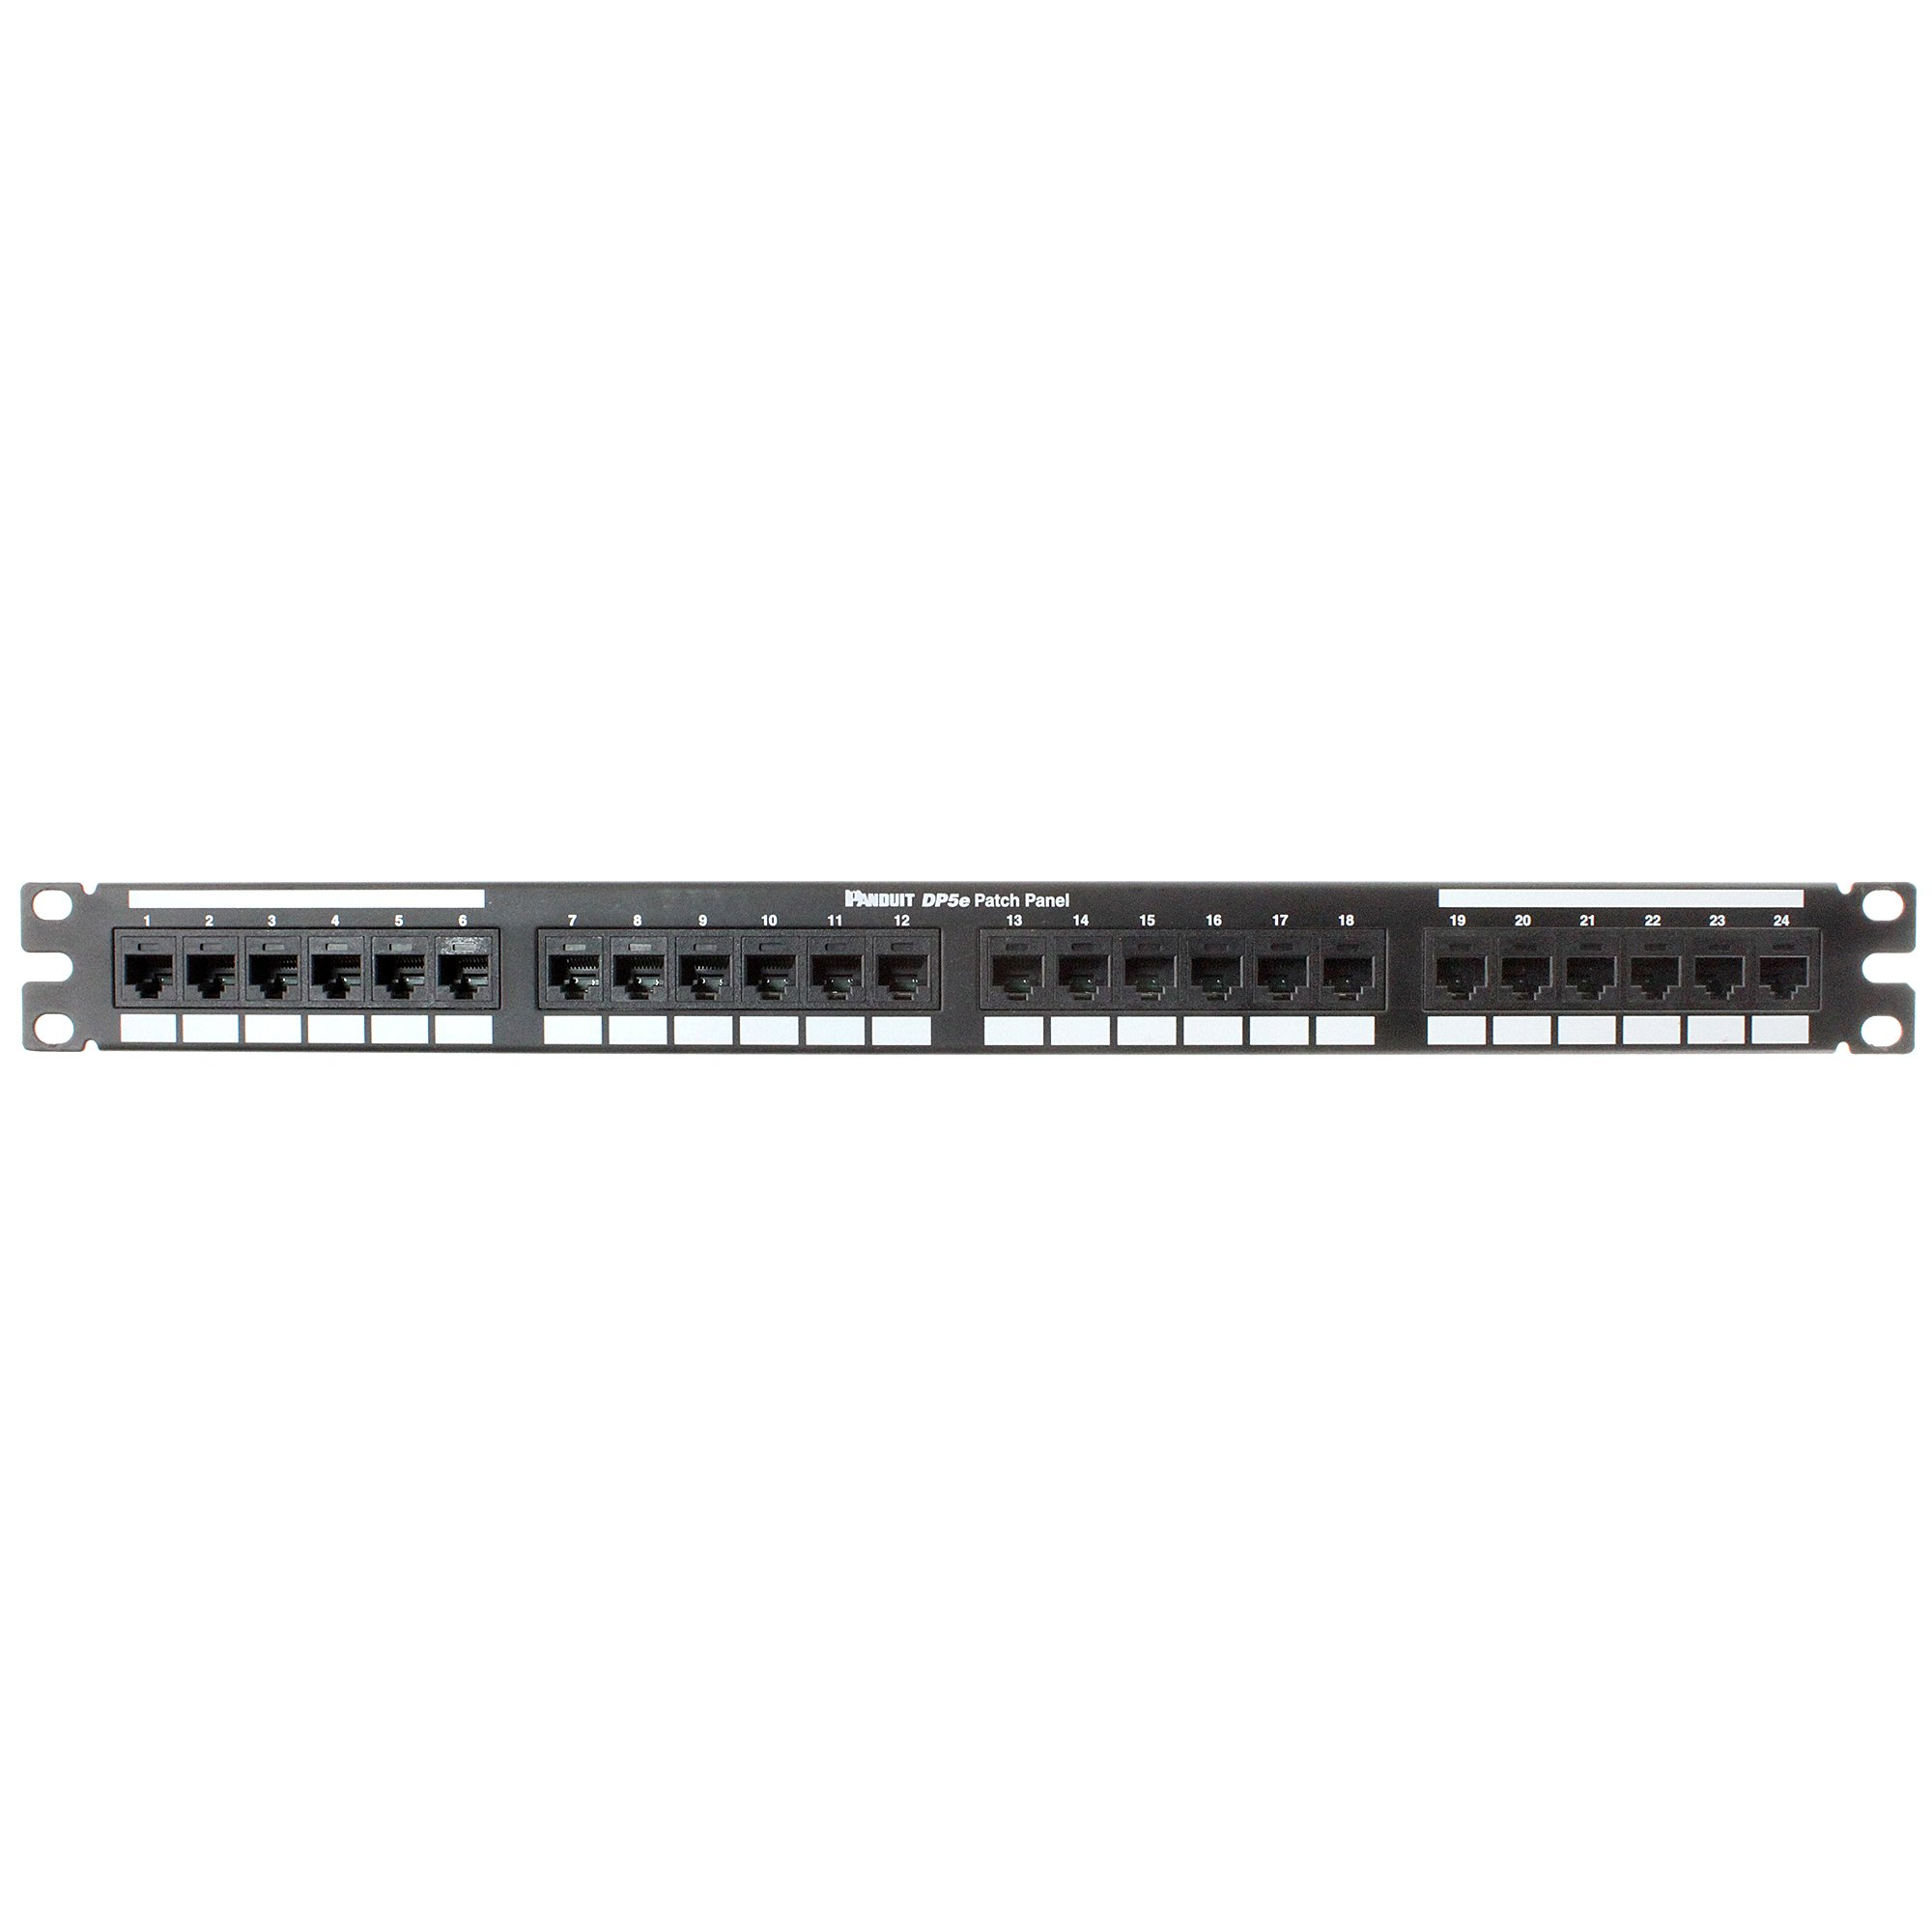 Panduit DP245E88TGY Category-5E 24-Port Flat Punchdown Patch Panel, Black